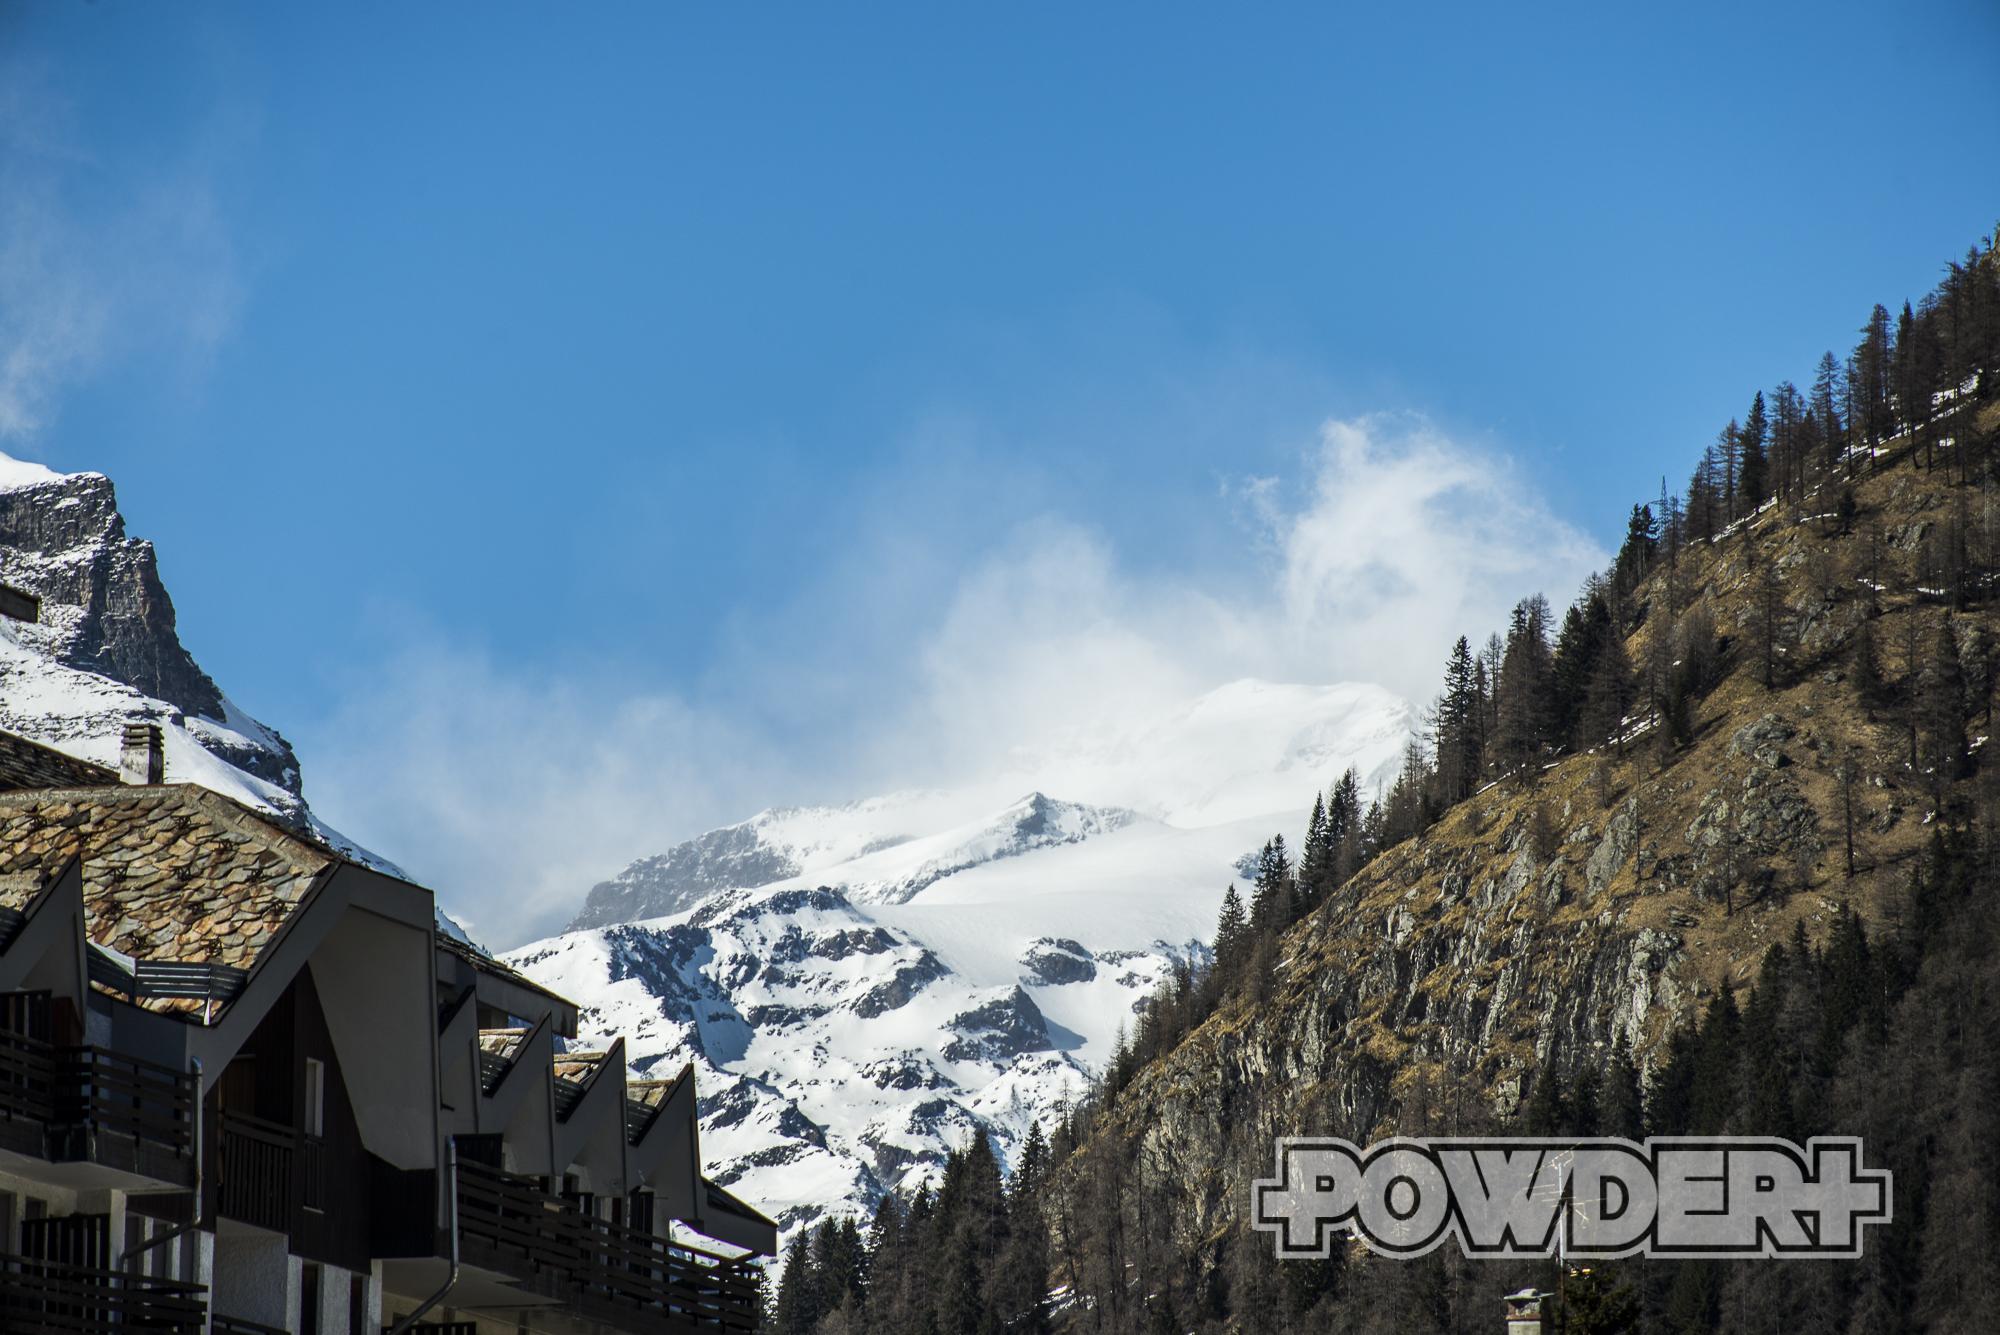 freeride, powder report, monte rosa, gressoney